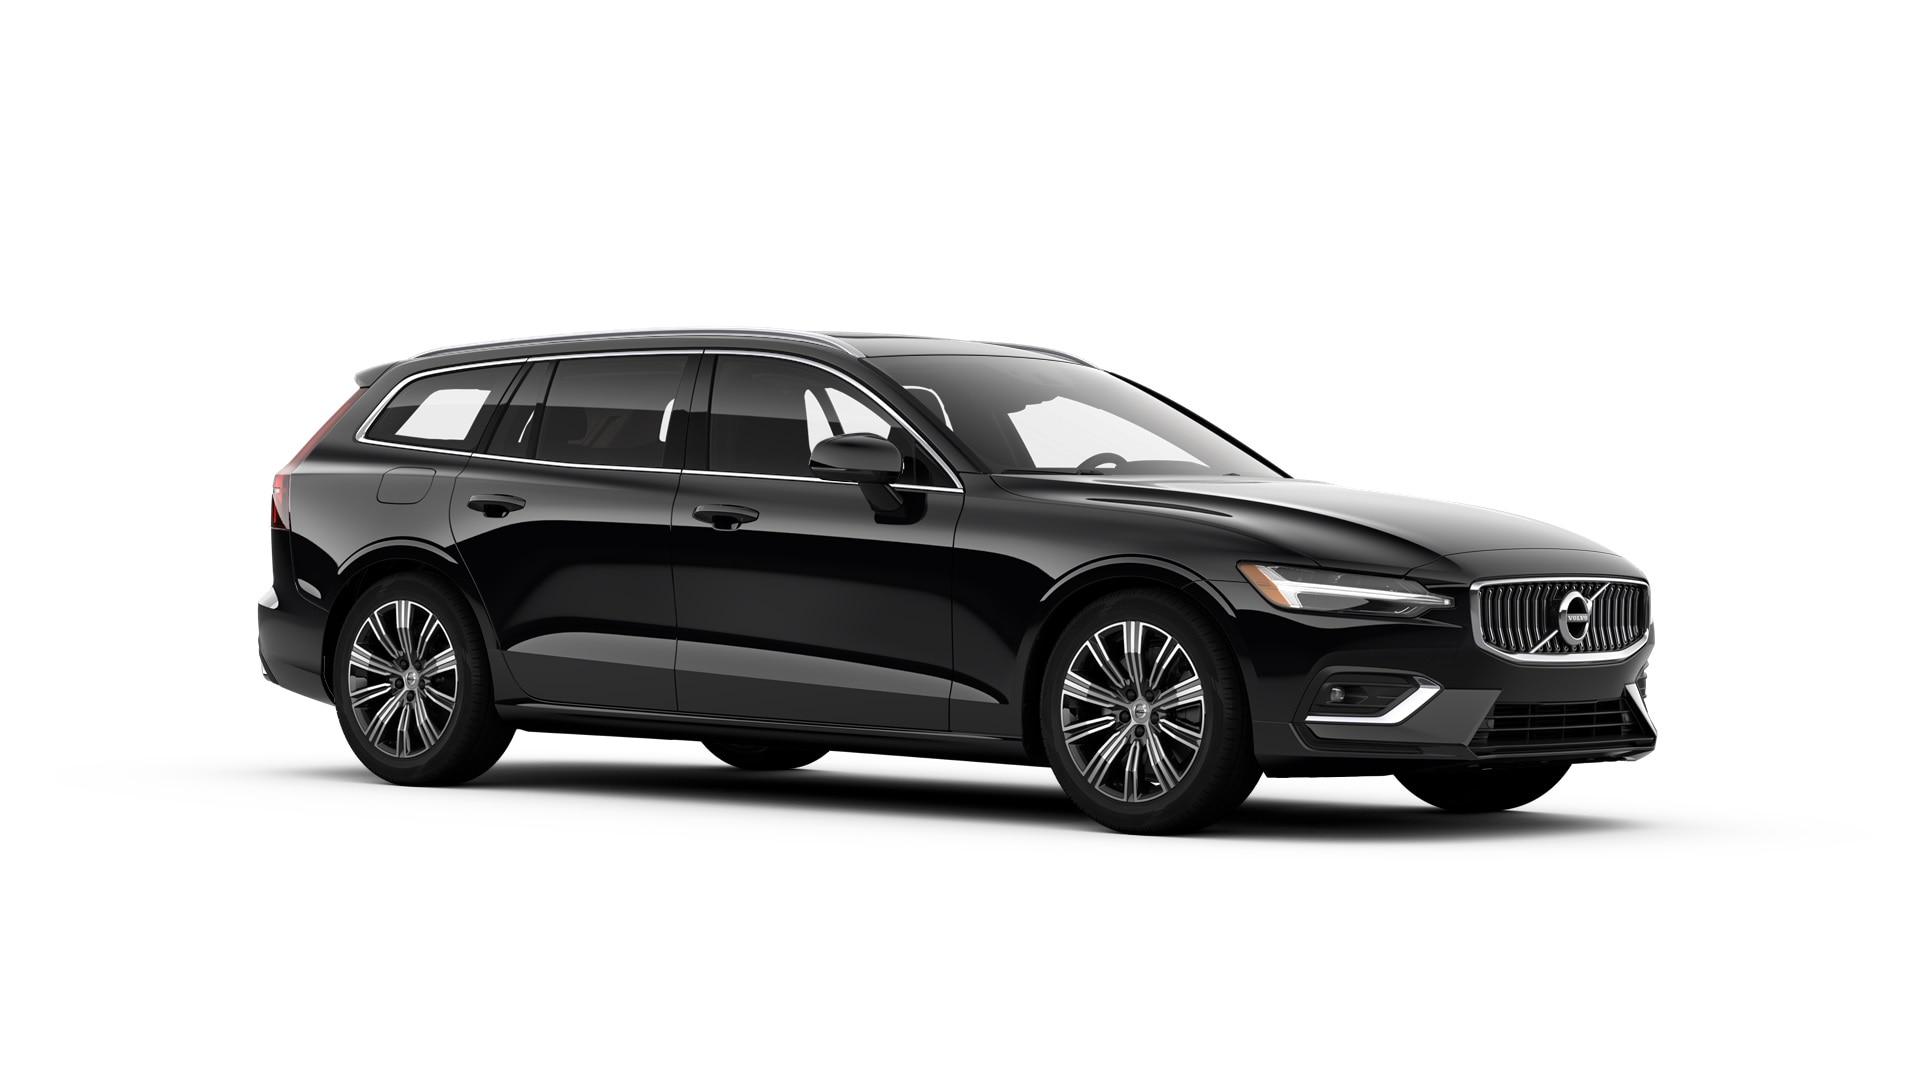 Volvo V60 2019 Pierre noire